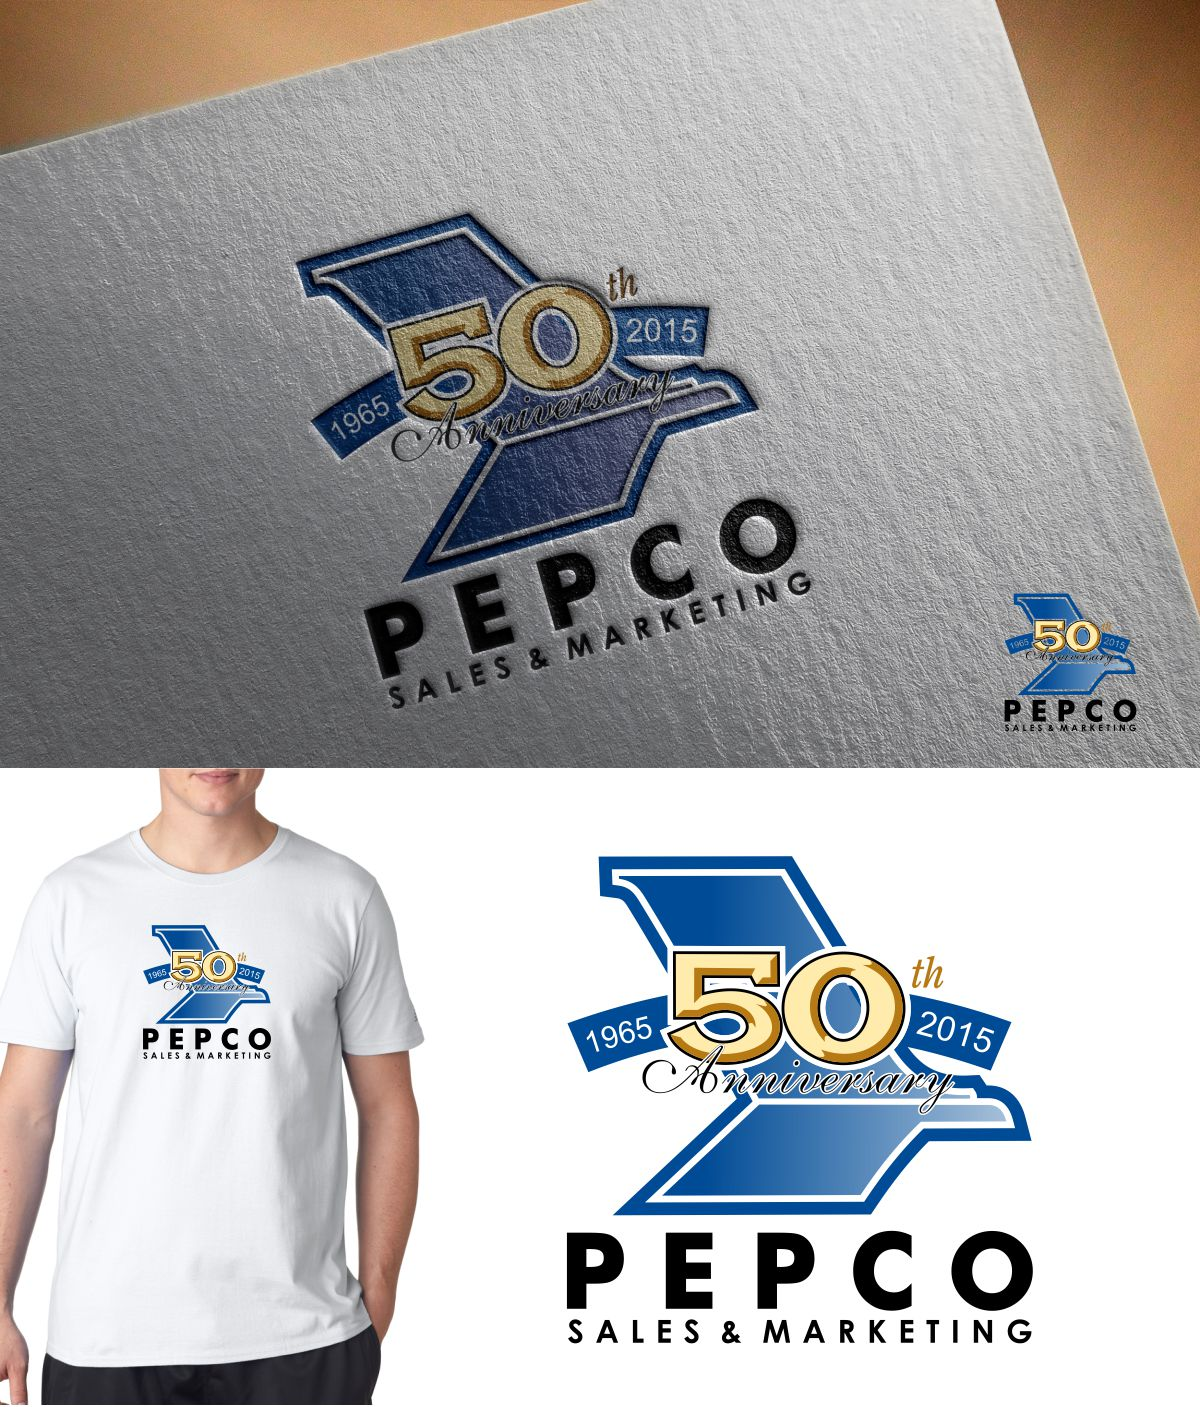 Logo Design by Mhon_Rose - Entry No. 25 in the Logo Design Contest 50th Anniversary Logo Design for Pepco Sales  & Marketing.